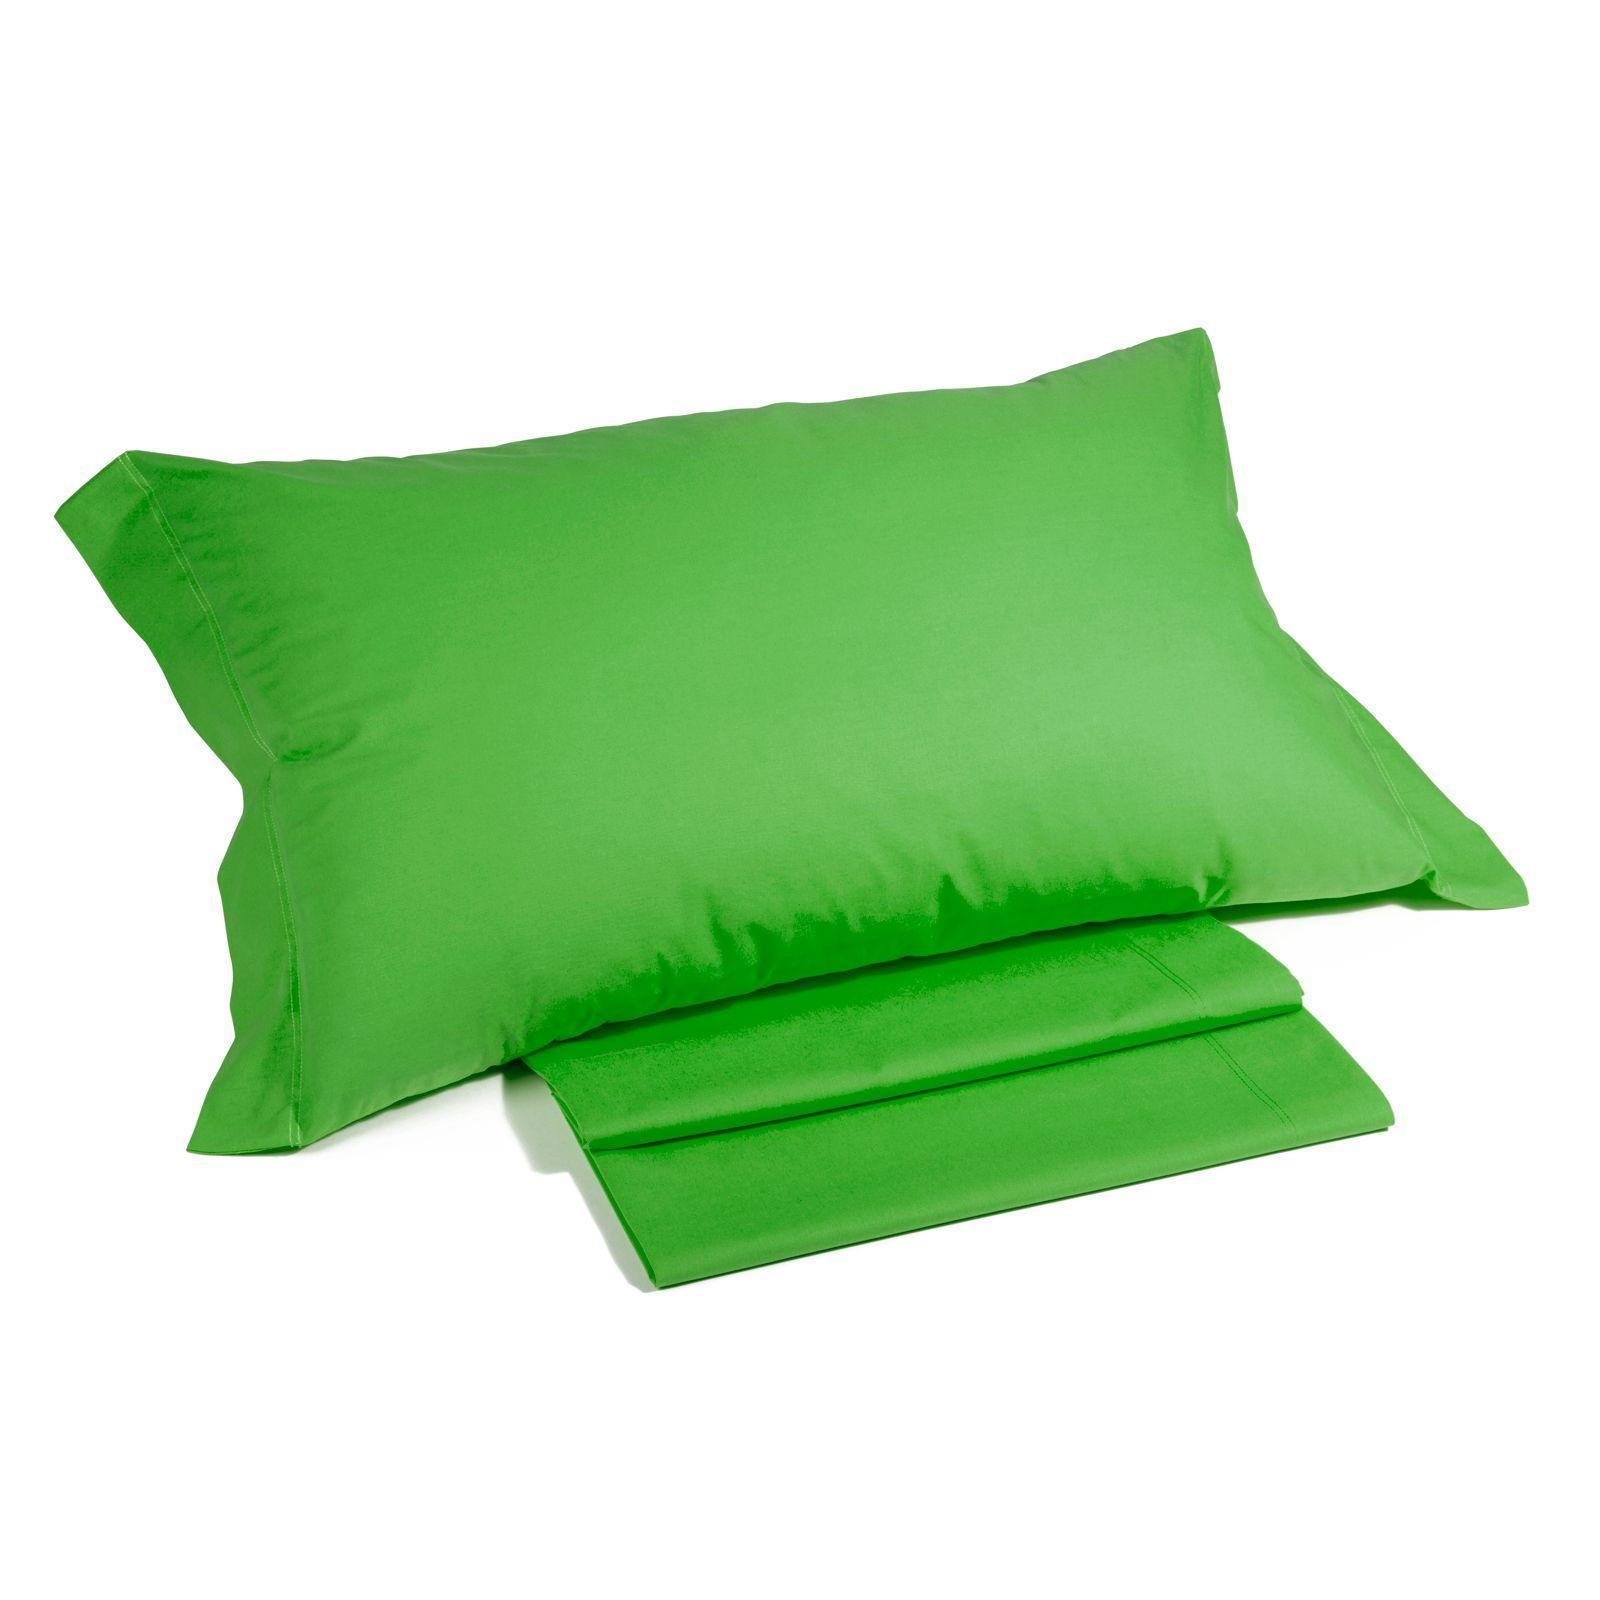 Для сна Наволочки 2шт 52х82 Caleffi Tinta Unita зеленые komplekt-navolochek-52h82-caleffi-tinta-unita-zelyonyy-italiya.jpg